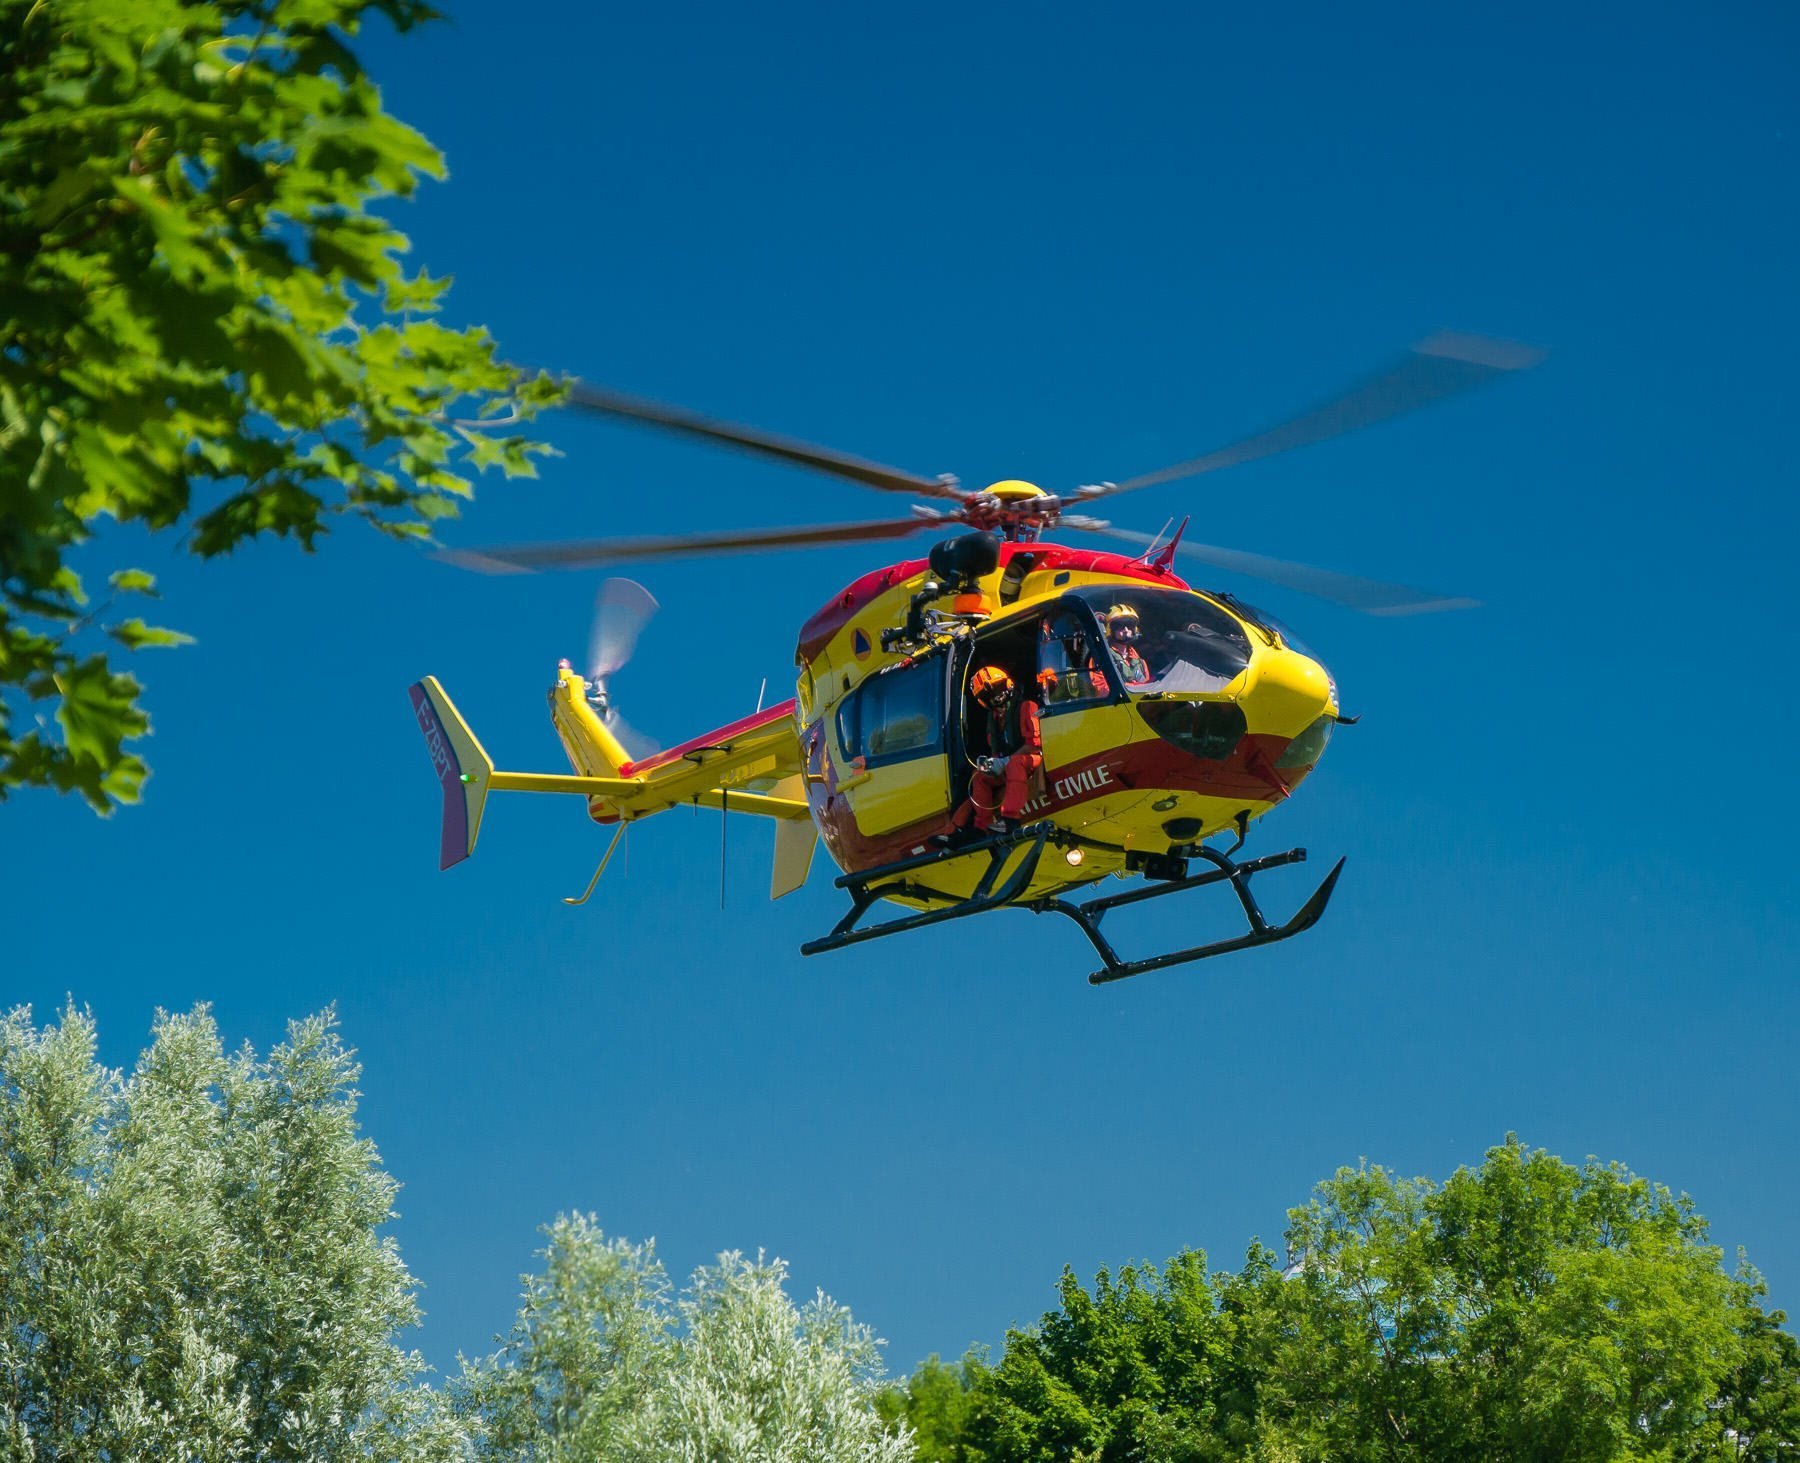 #sealadventures @sealadventures #snsm #rescue #sauvetage #helicopters